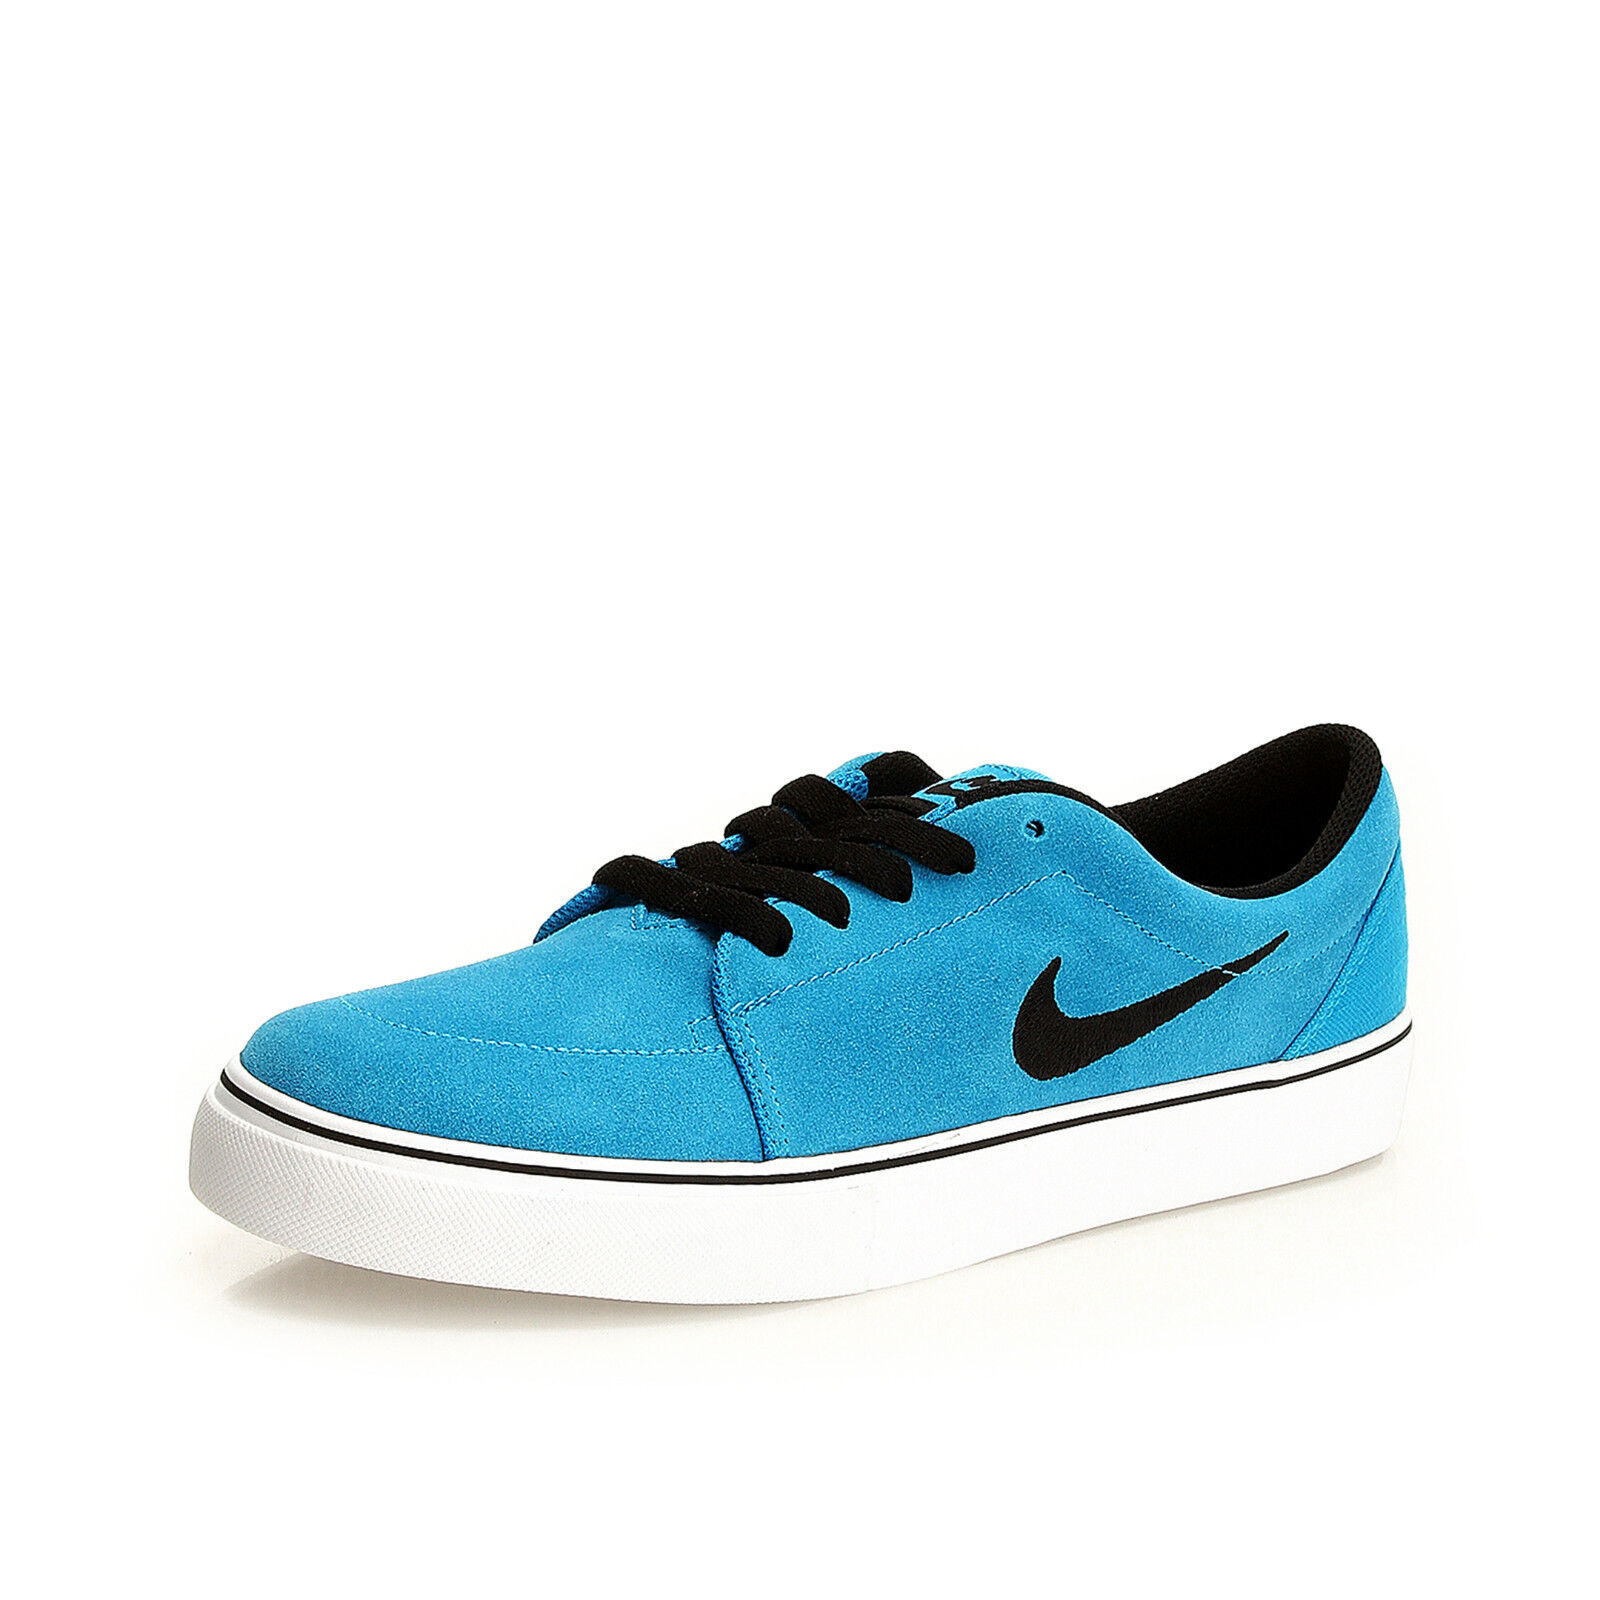 Nike SB SATIRE Sneaker 536404 Türkis Weiß 405 Skaterschuhe Sportschuhe NEU OVP